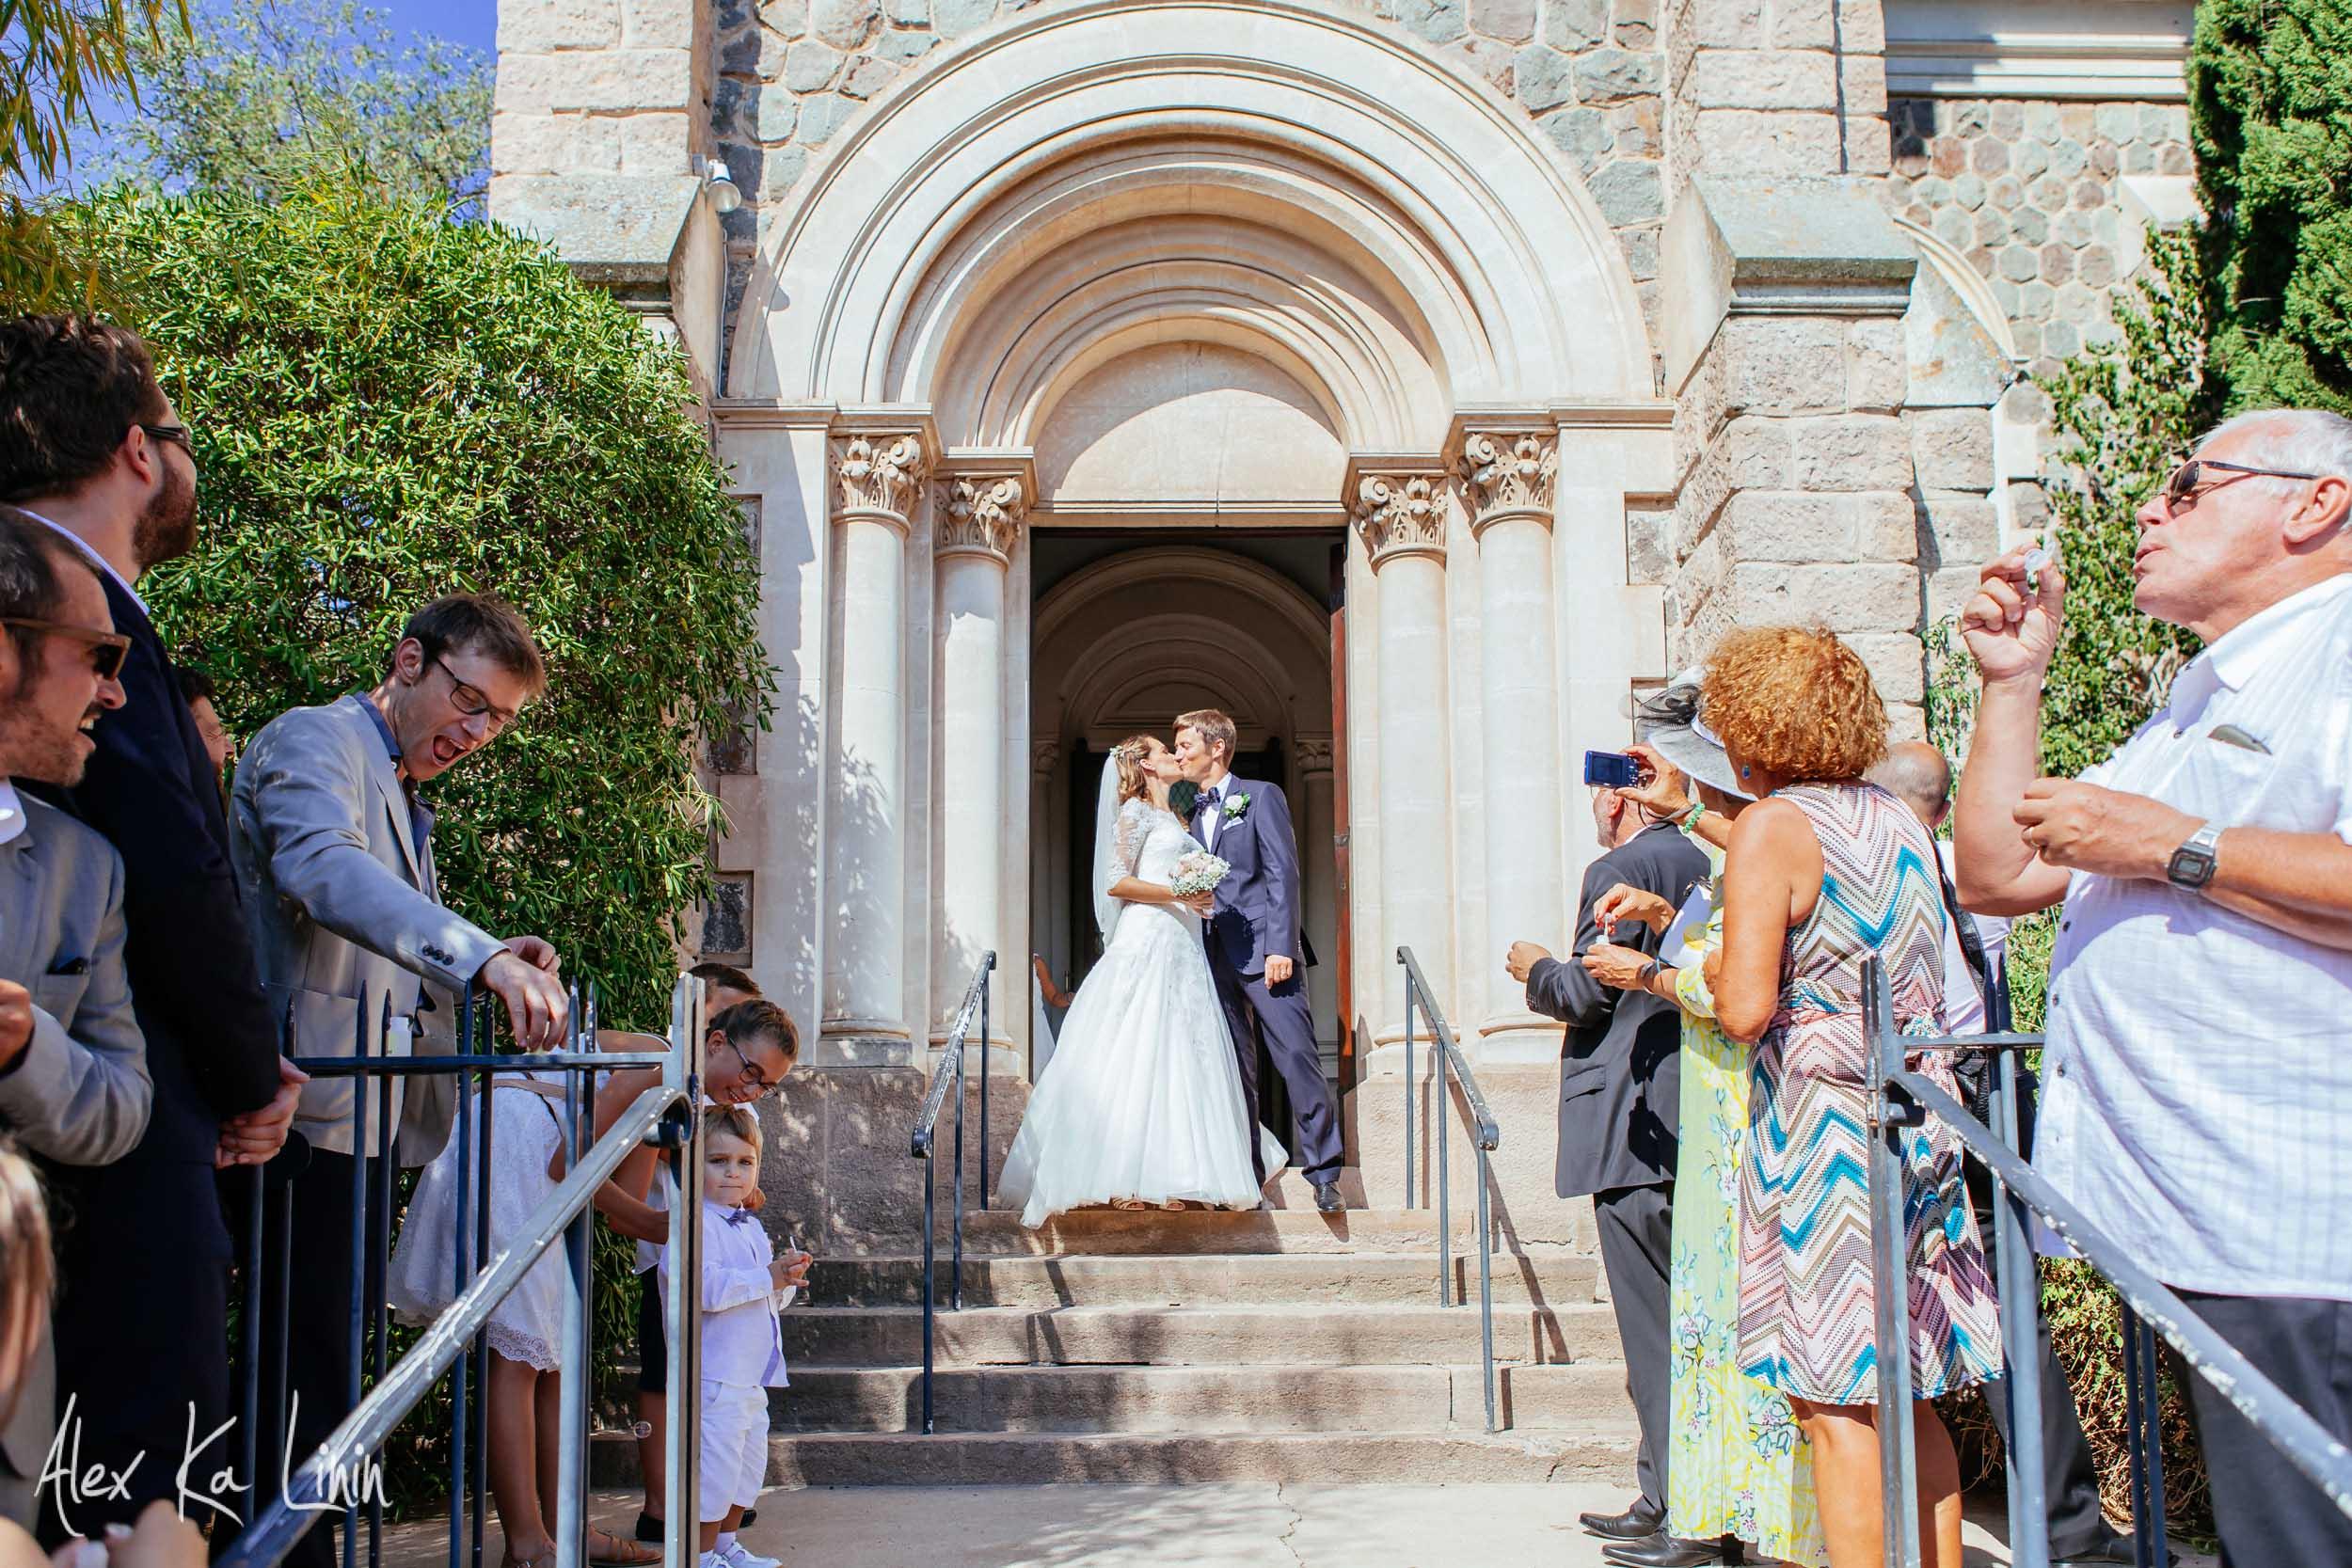 AlexKa_wedding_mariage_photographer-31.jpg